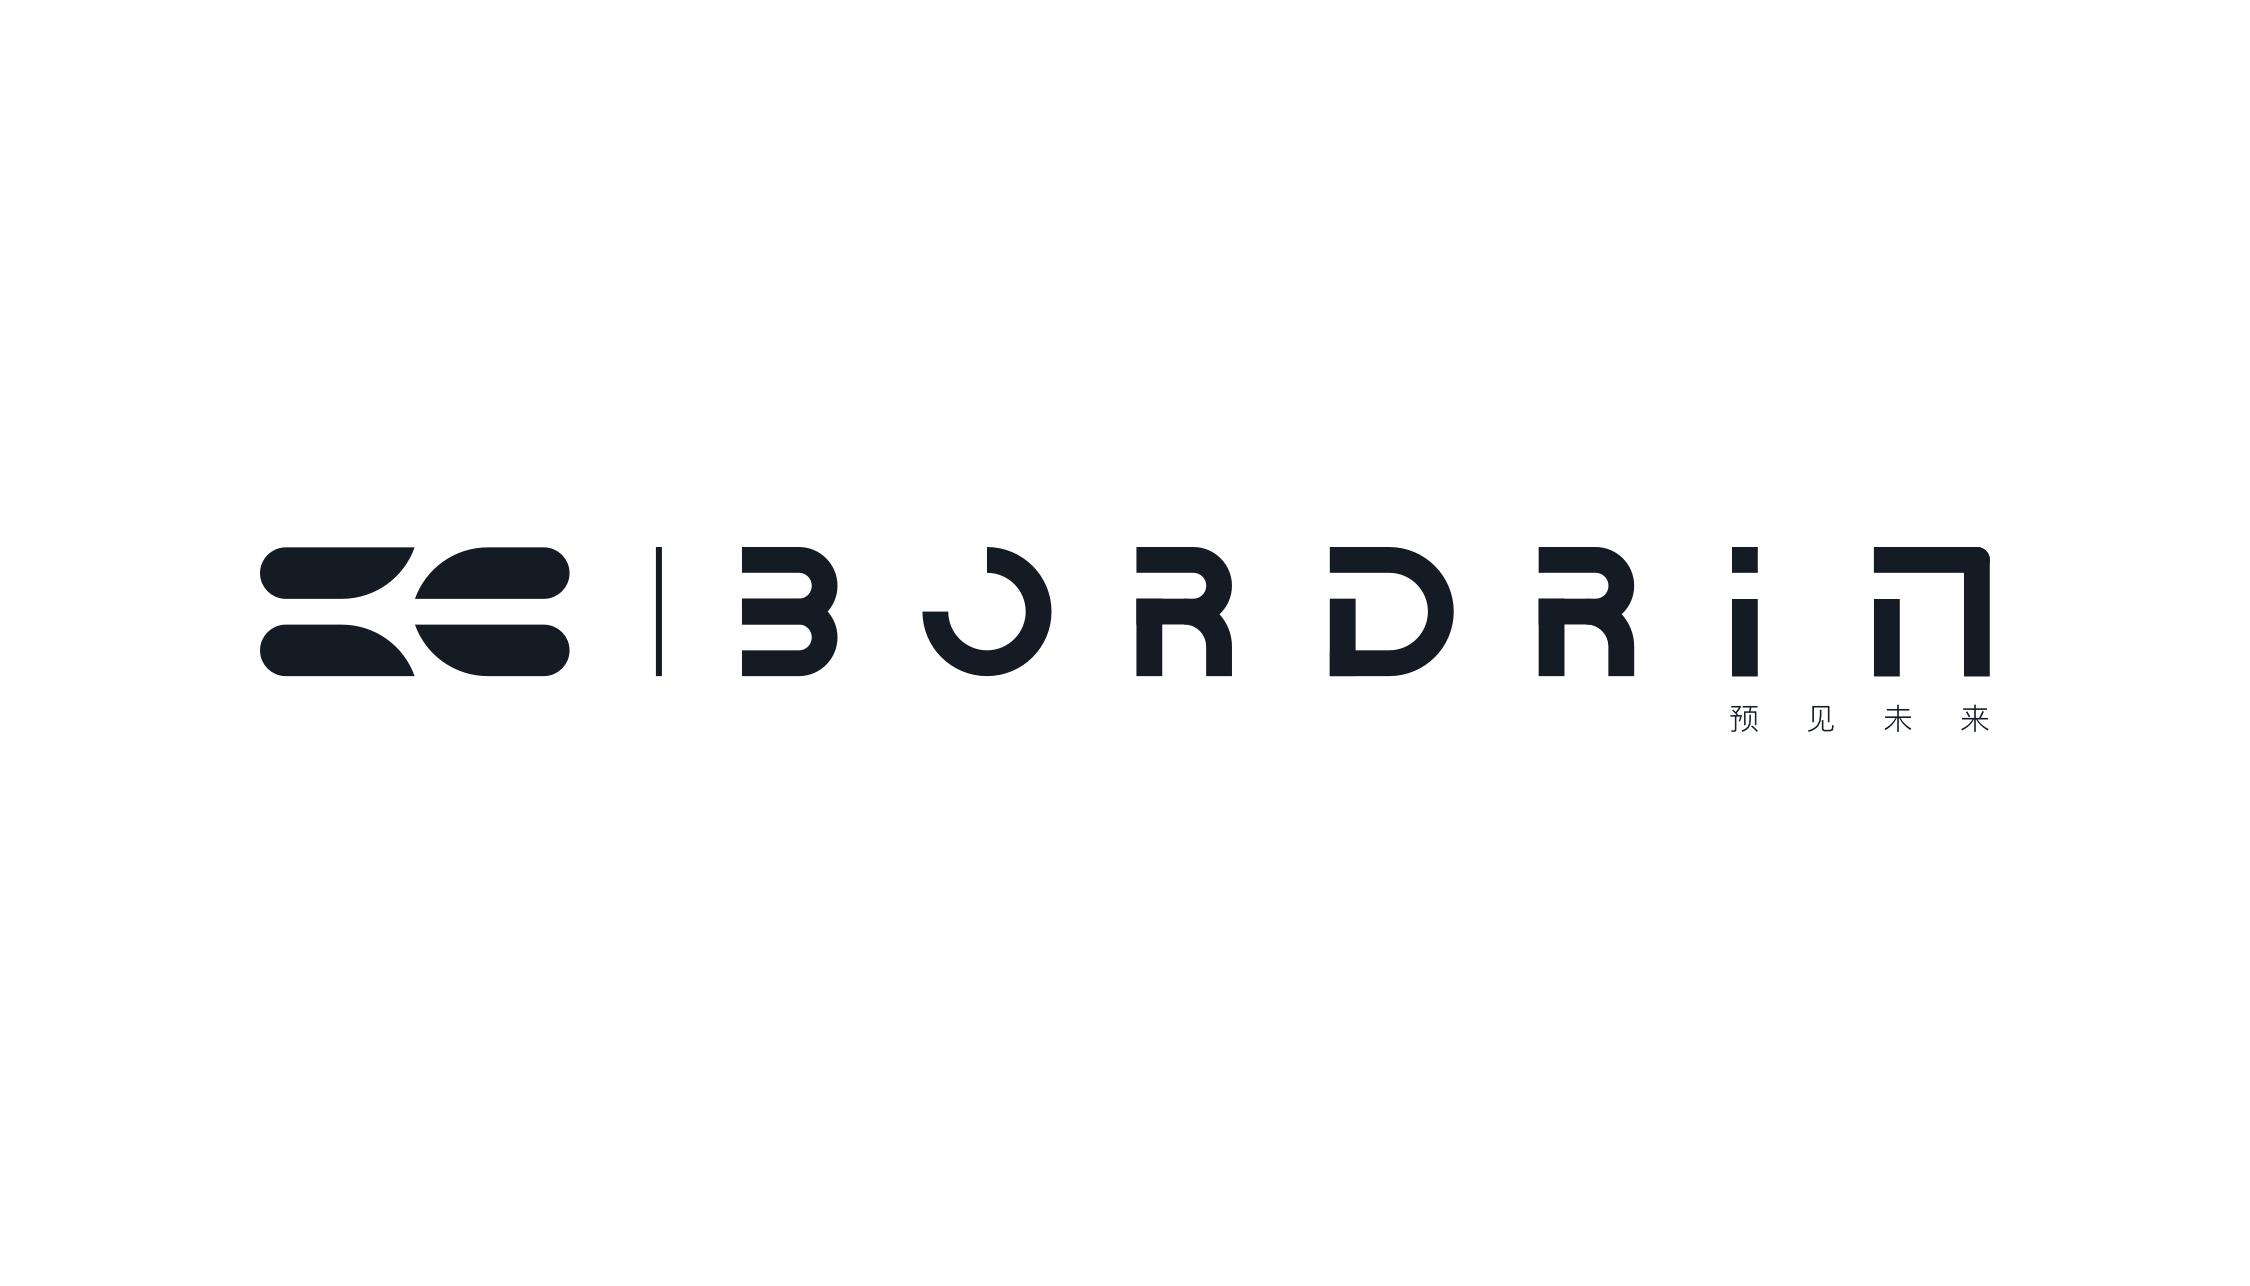 bordrin-预见未来|平面|标志|凯利欧文 - 原创作品图片